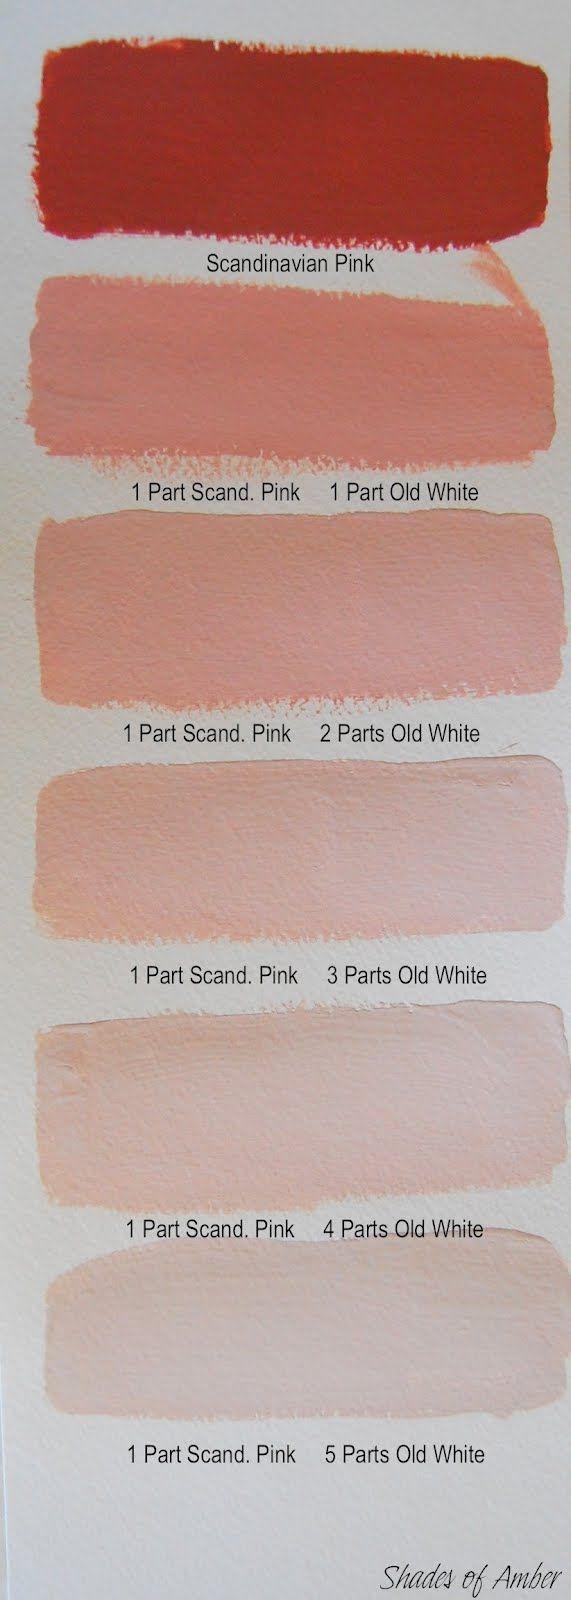 annie sloan chalk paint scandanavian pink | annie sloan